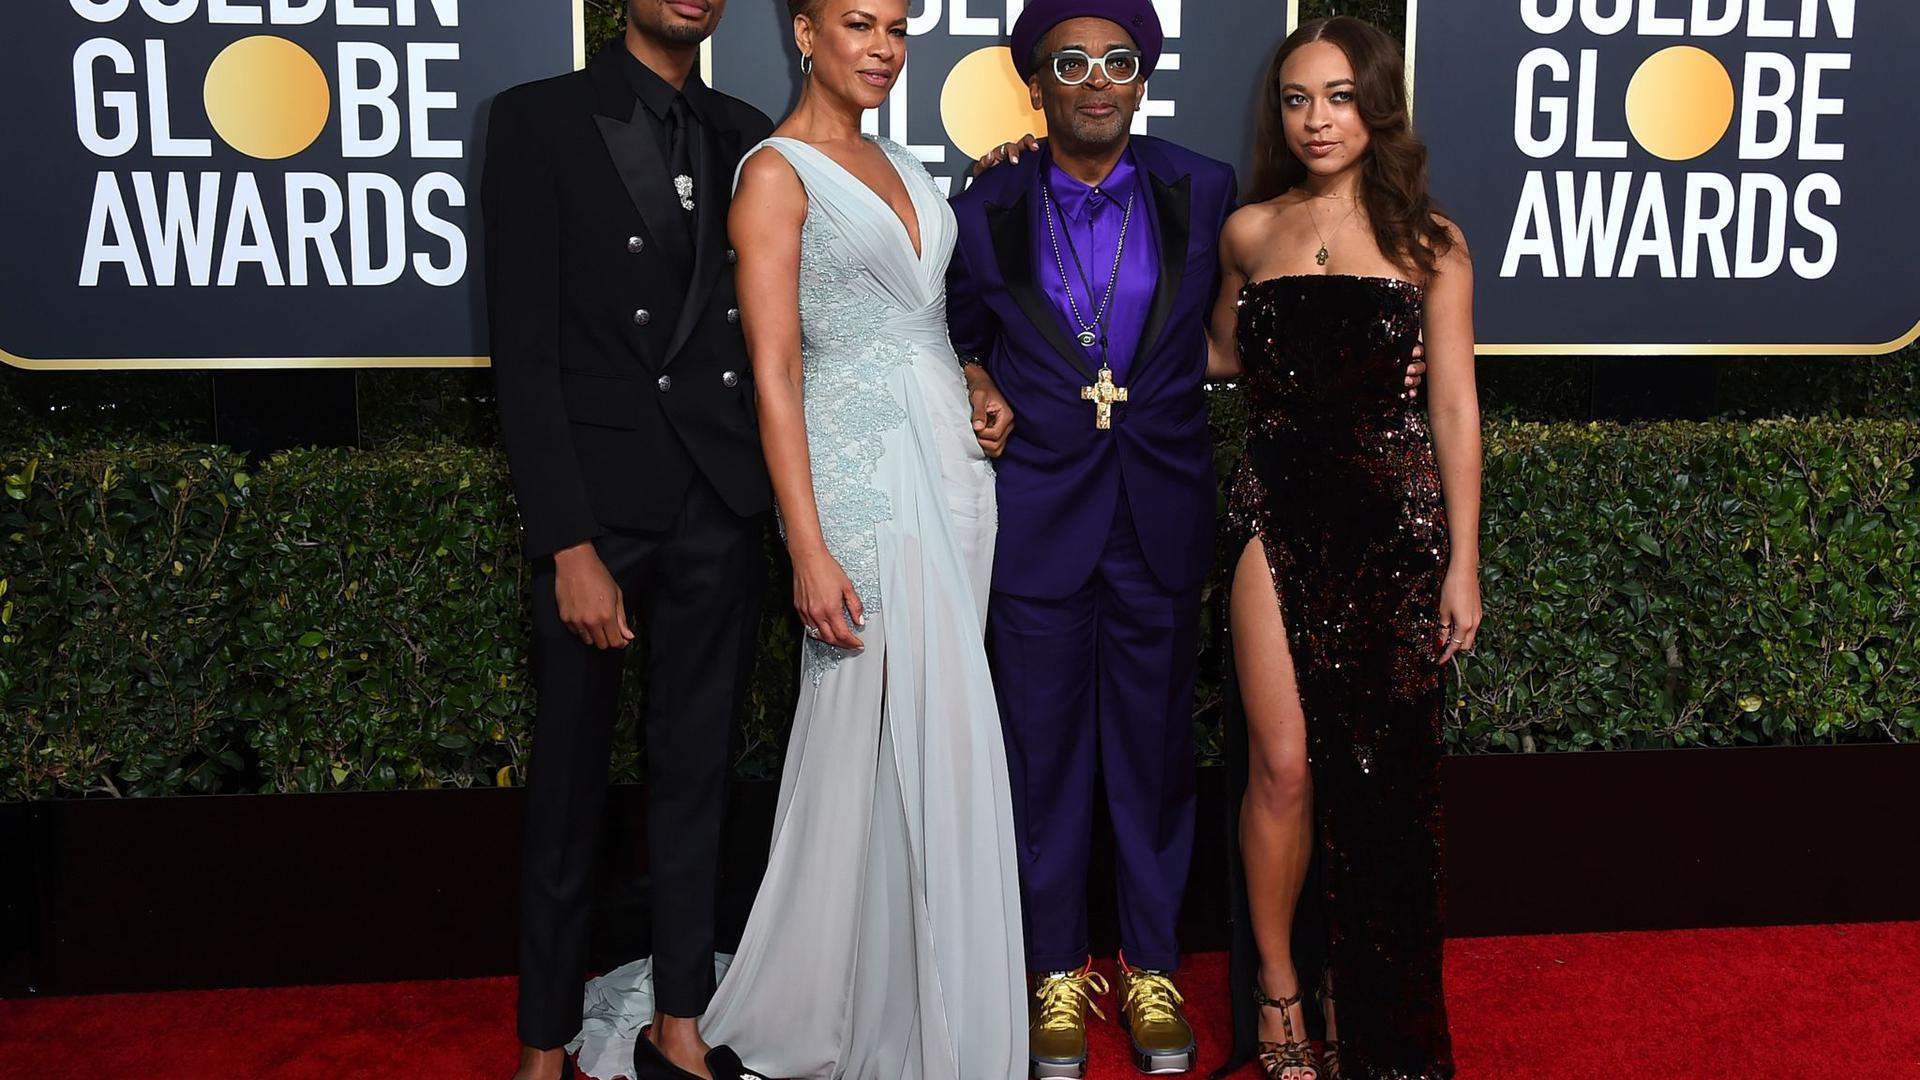 Regisseur Spike Lee (2.v.r) mit Sohn Jackson Lee, Ehefrau Tonya Lewis Lee und Tochter Satchel Lee bei der Golden Globe-Verleihung 2019.